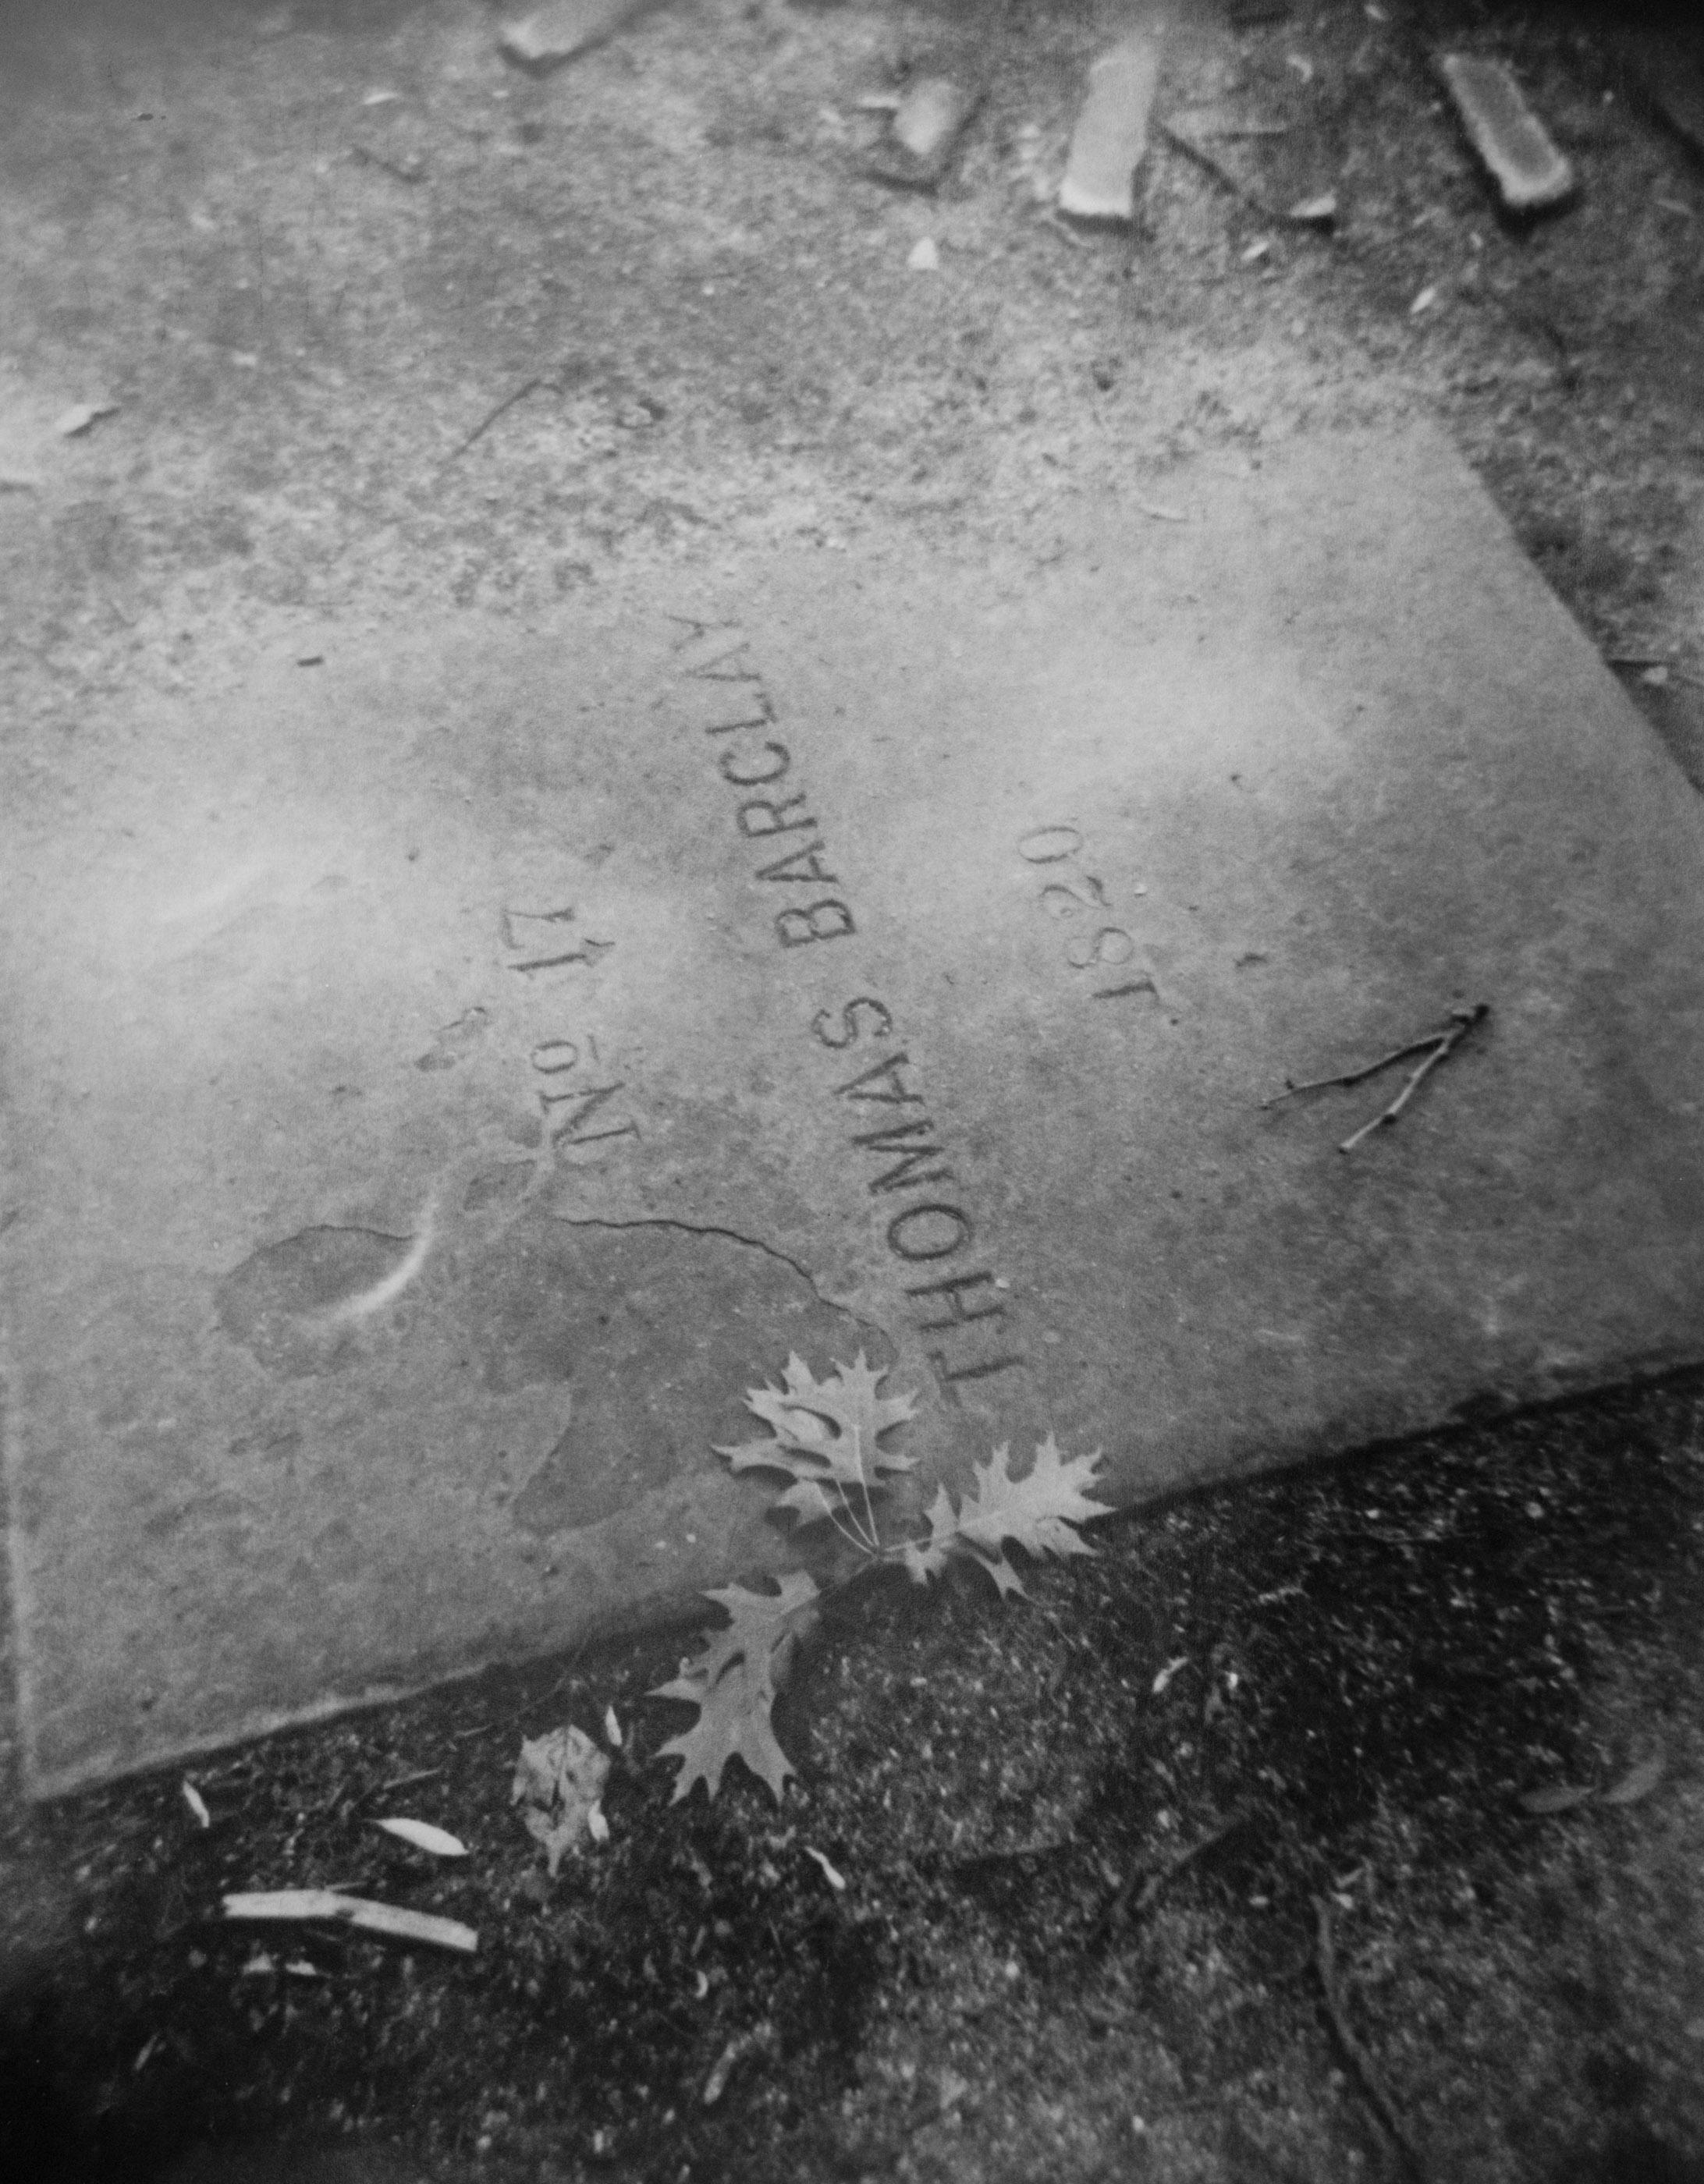 7_Grave Ground_St. Mark's Church-in-the-Bowerie, 1999-2000_.jpg